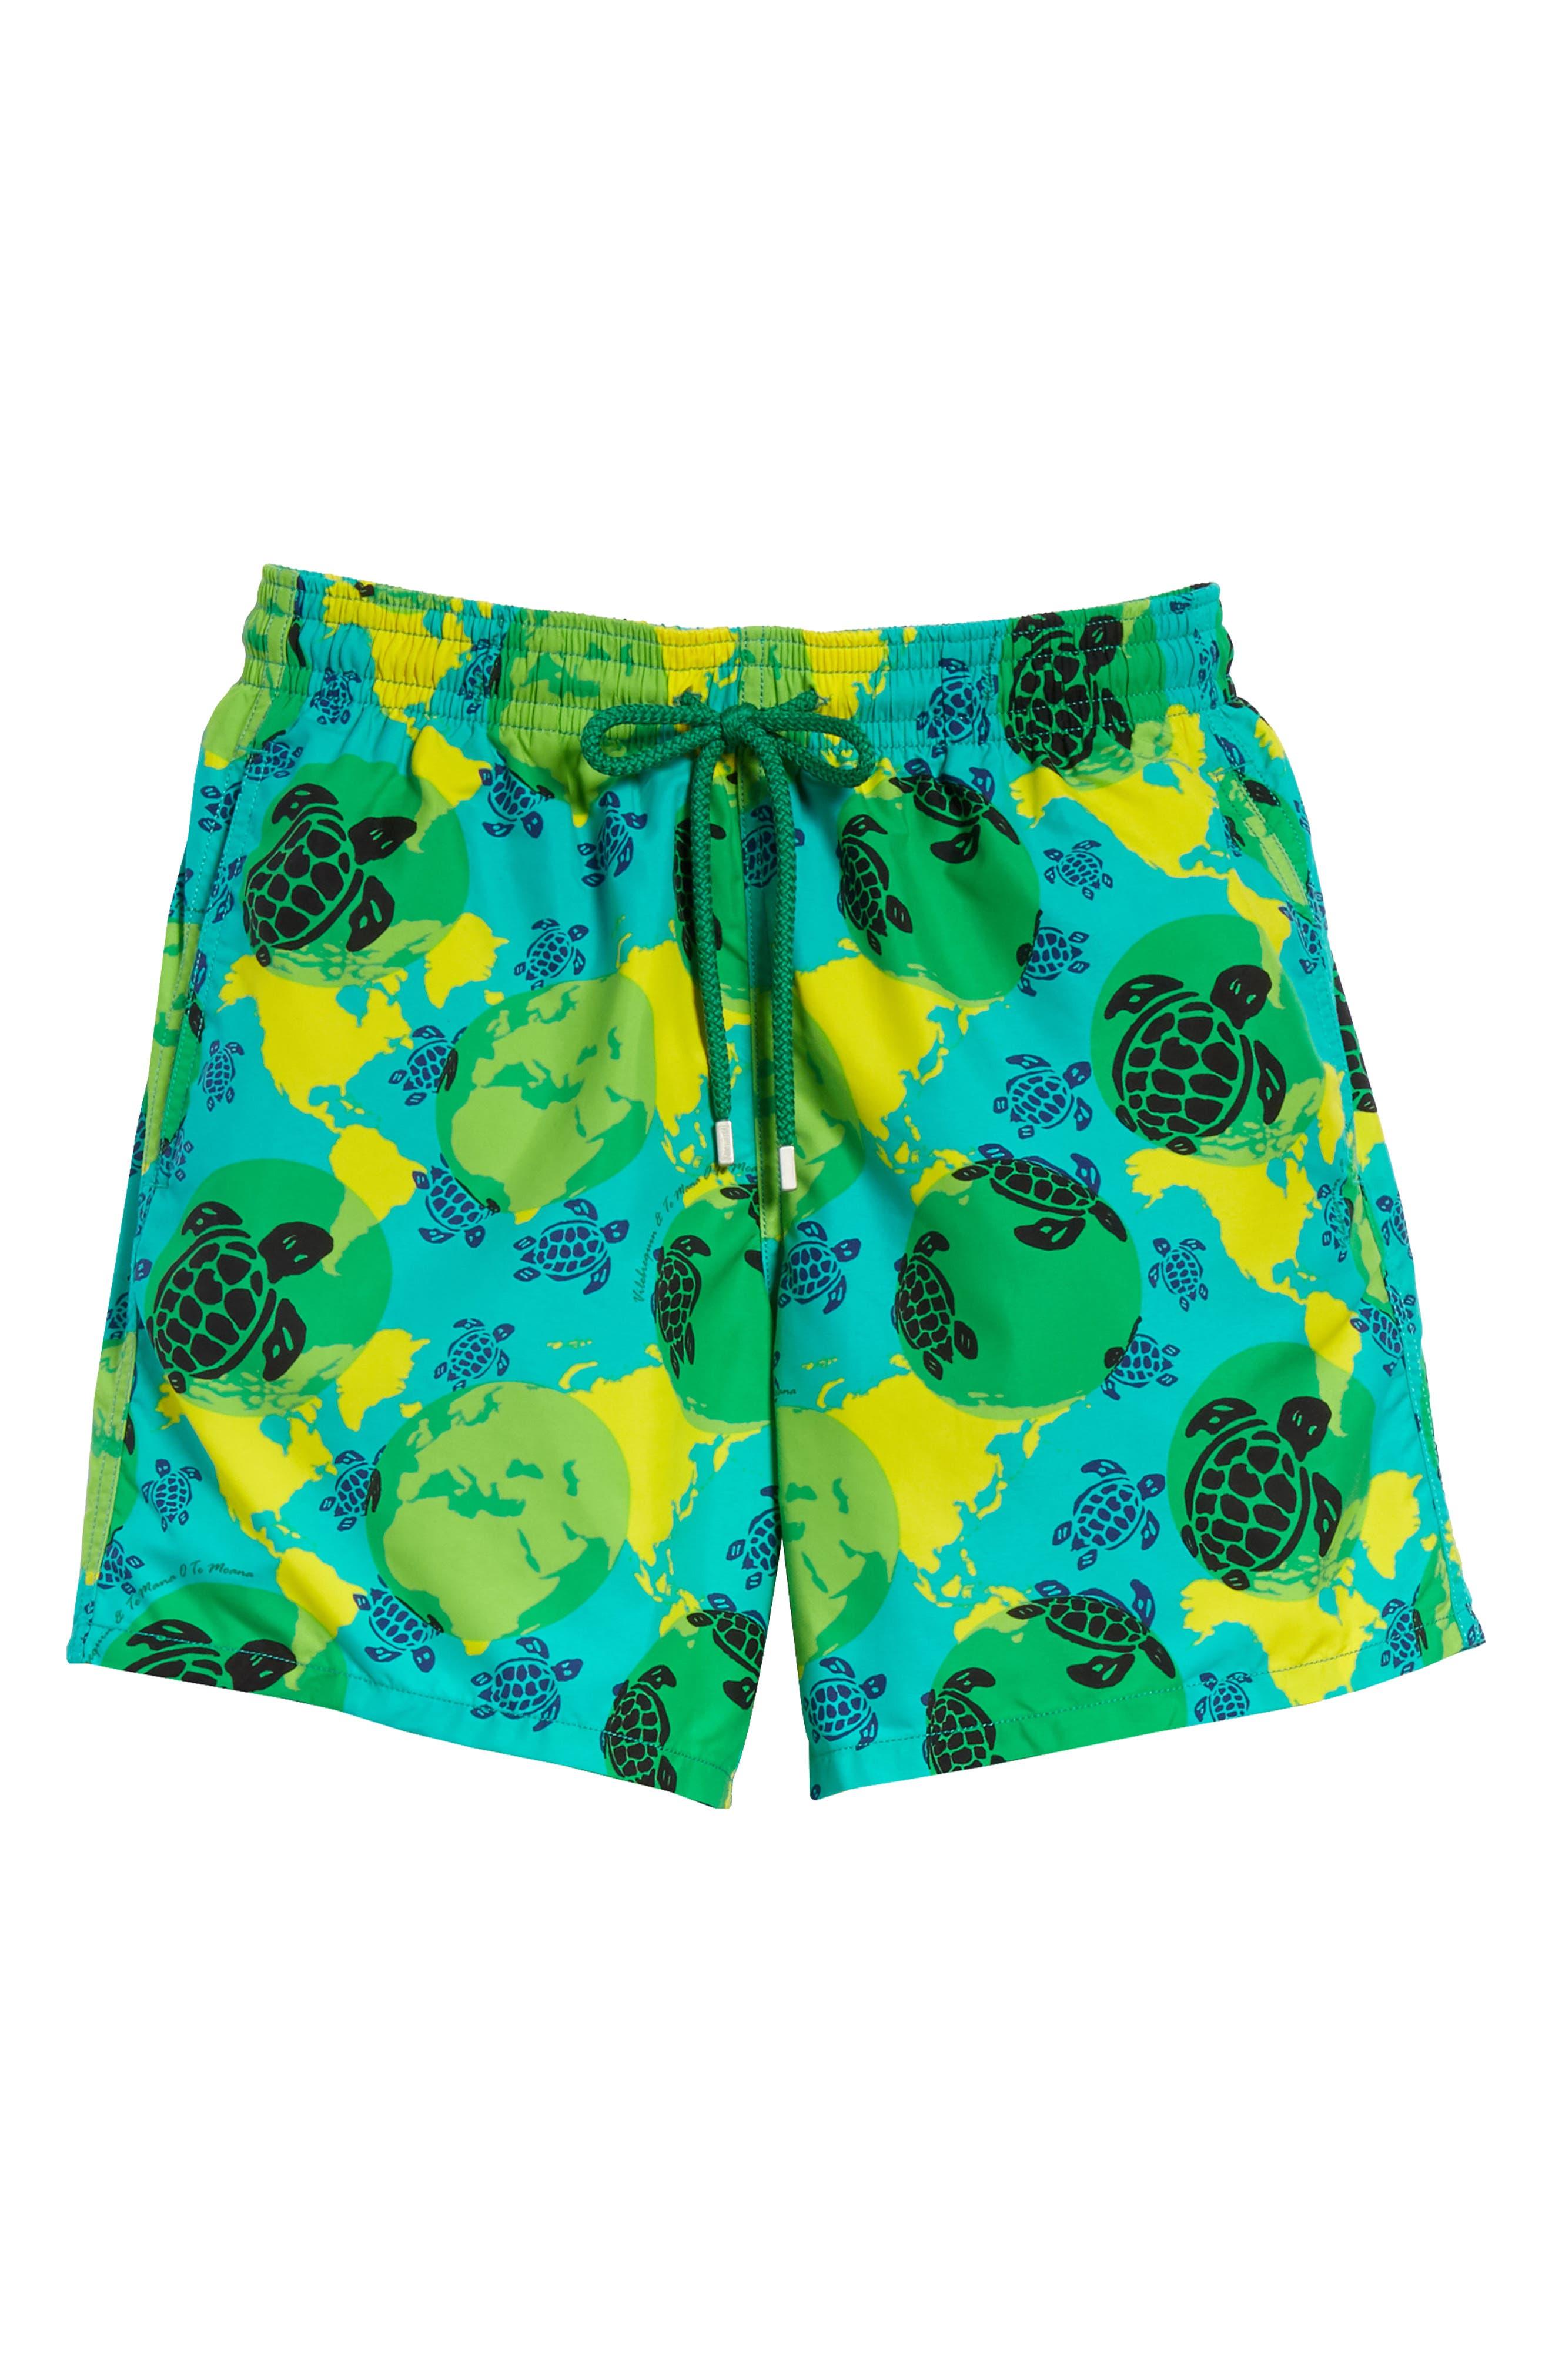 Eco Turtle Print Swim Trunks,                             Alternate thumbnail 6, color,                             VERONESE GREEN